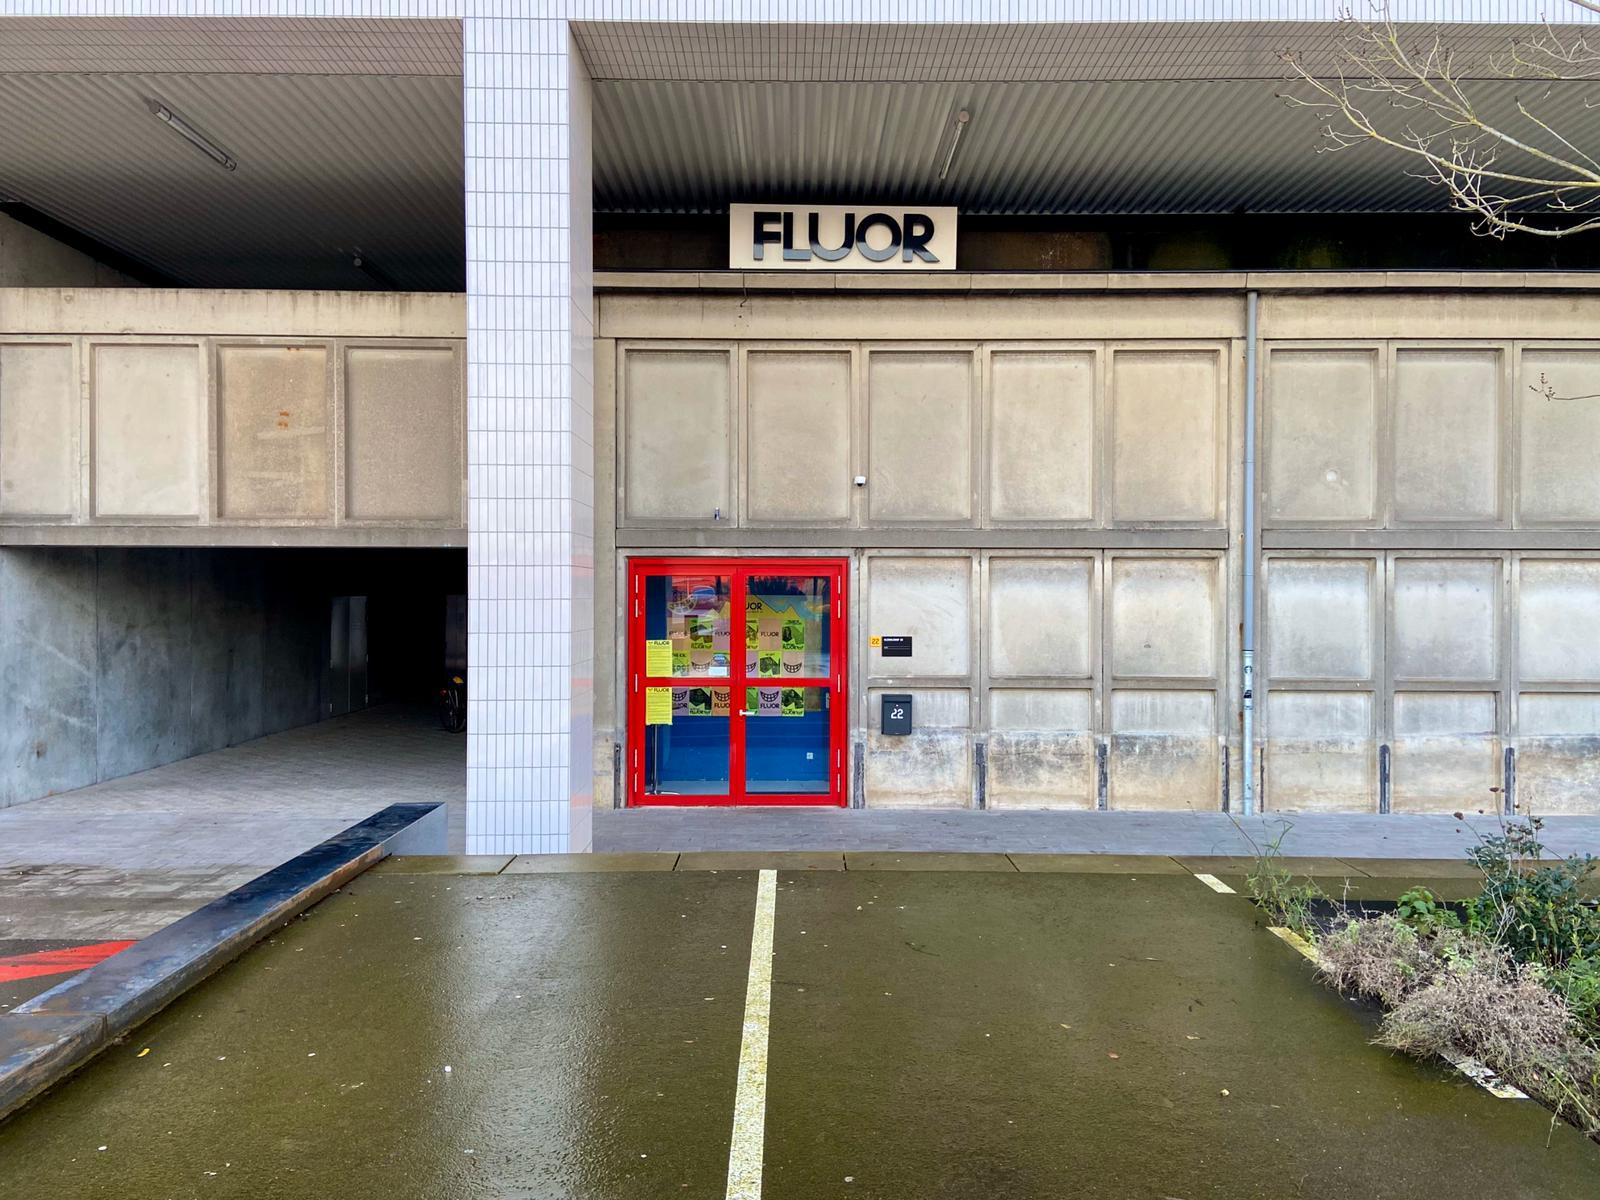 FLUOR. Foto: Ingelise de Vries